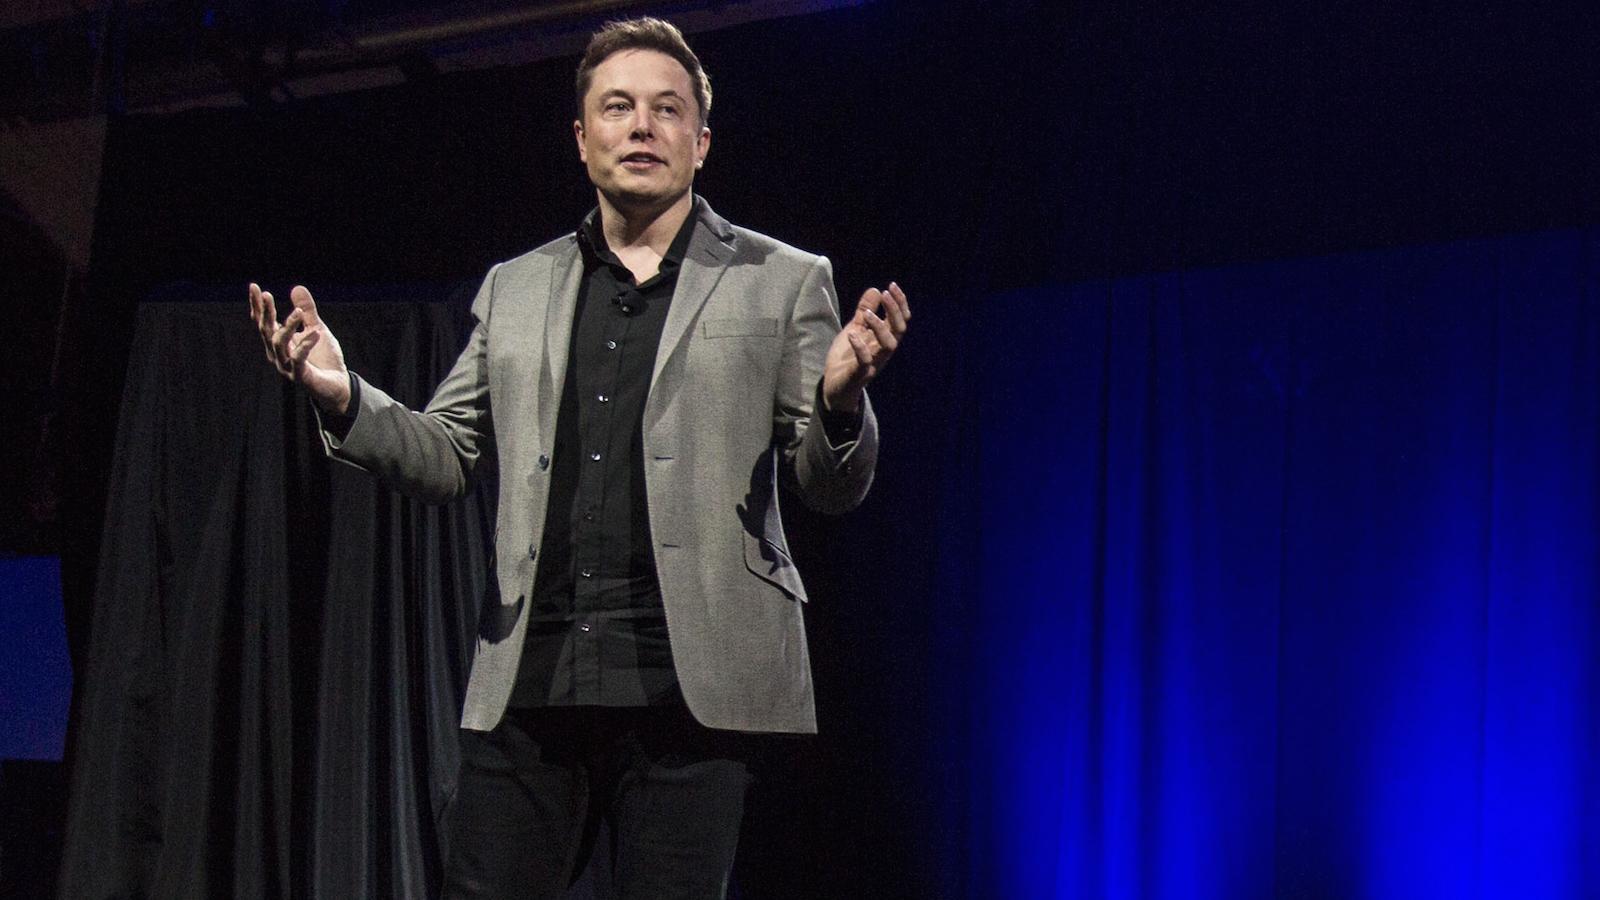 Elon Musk Tesla Electric Plane